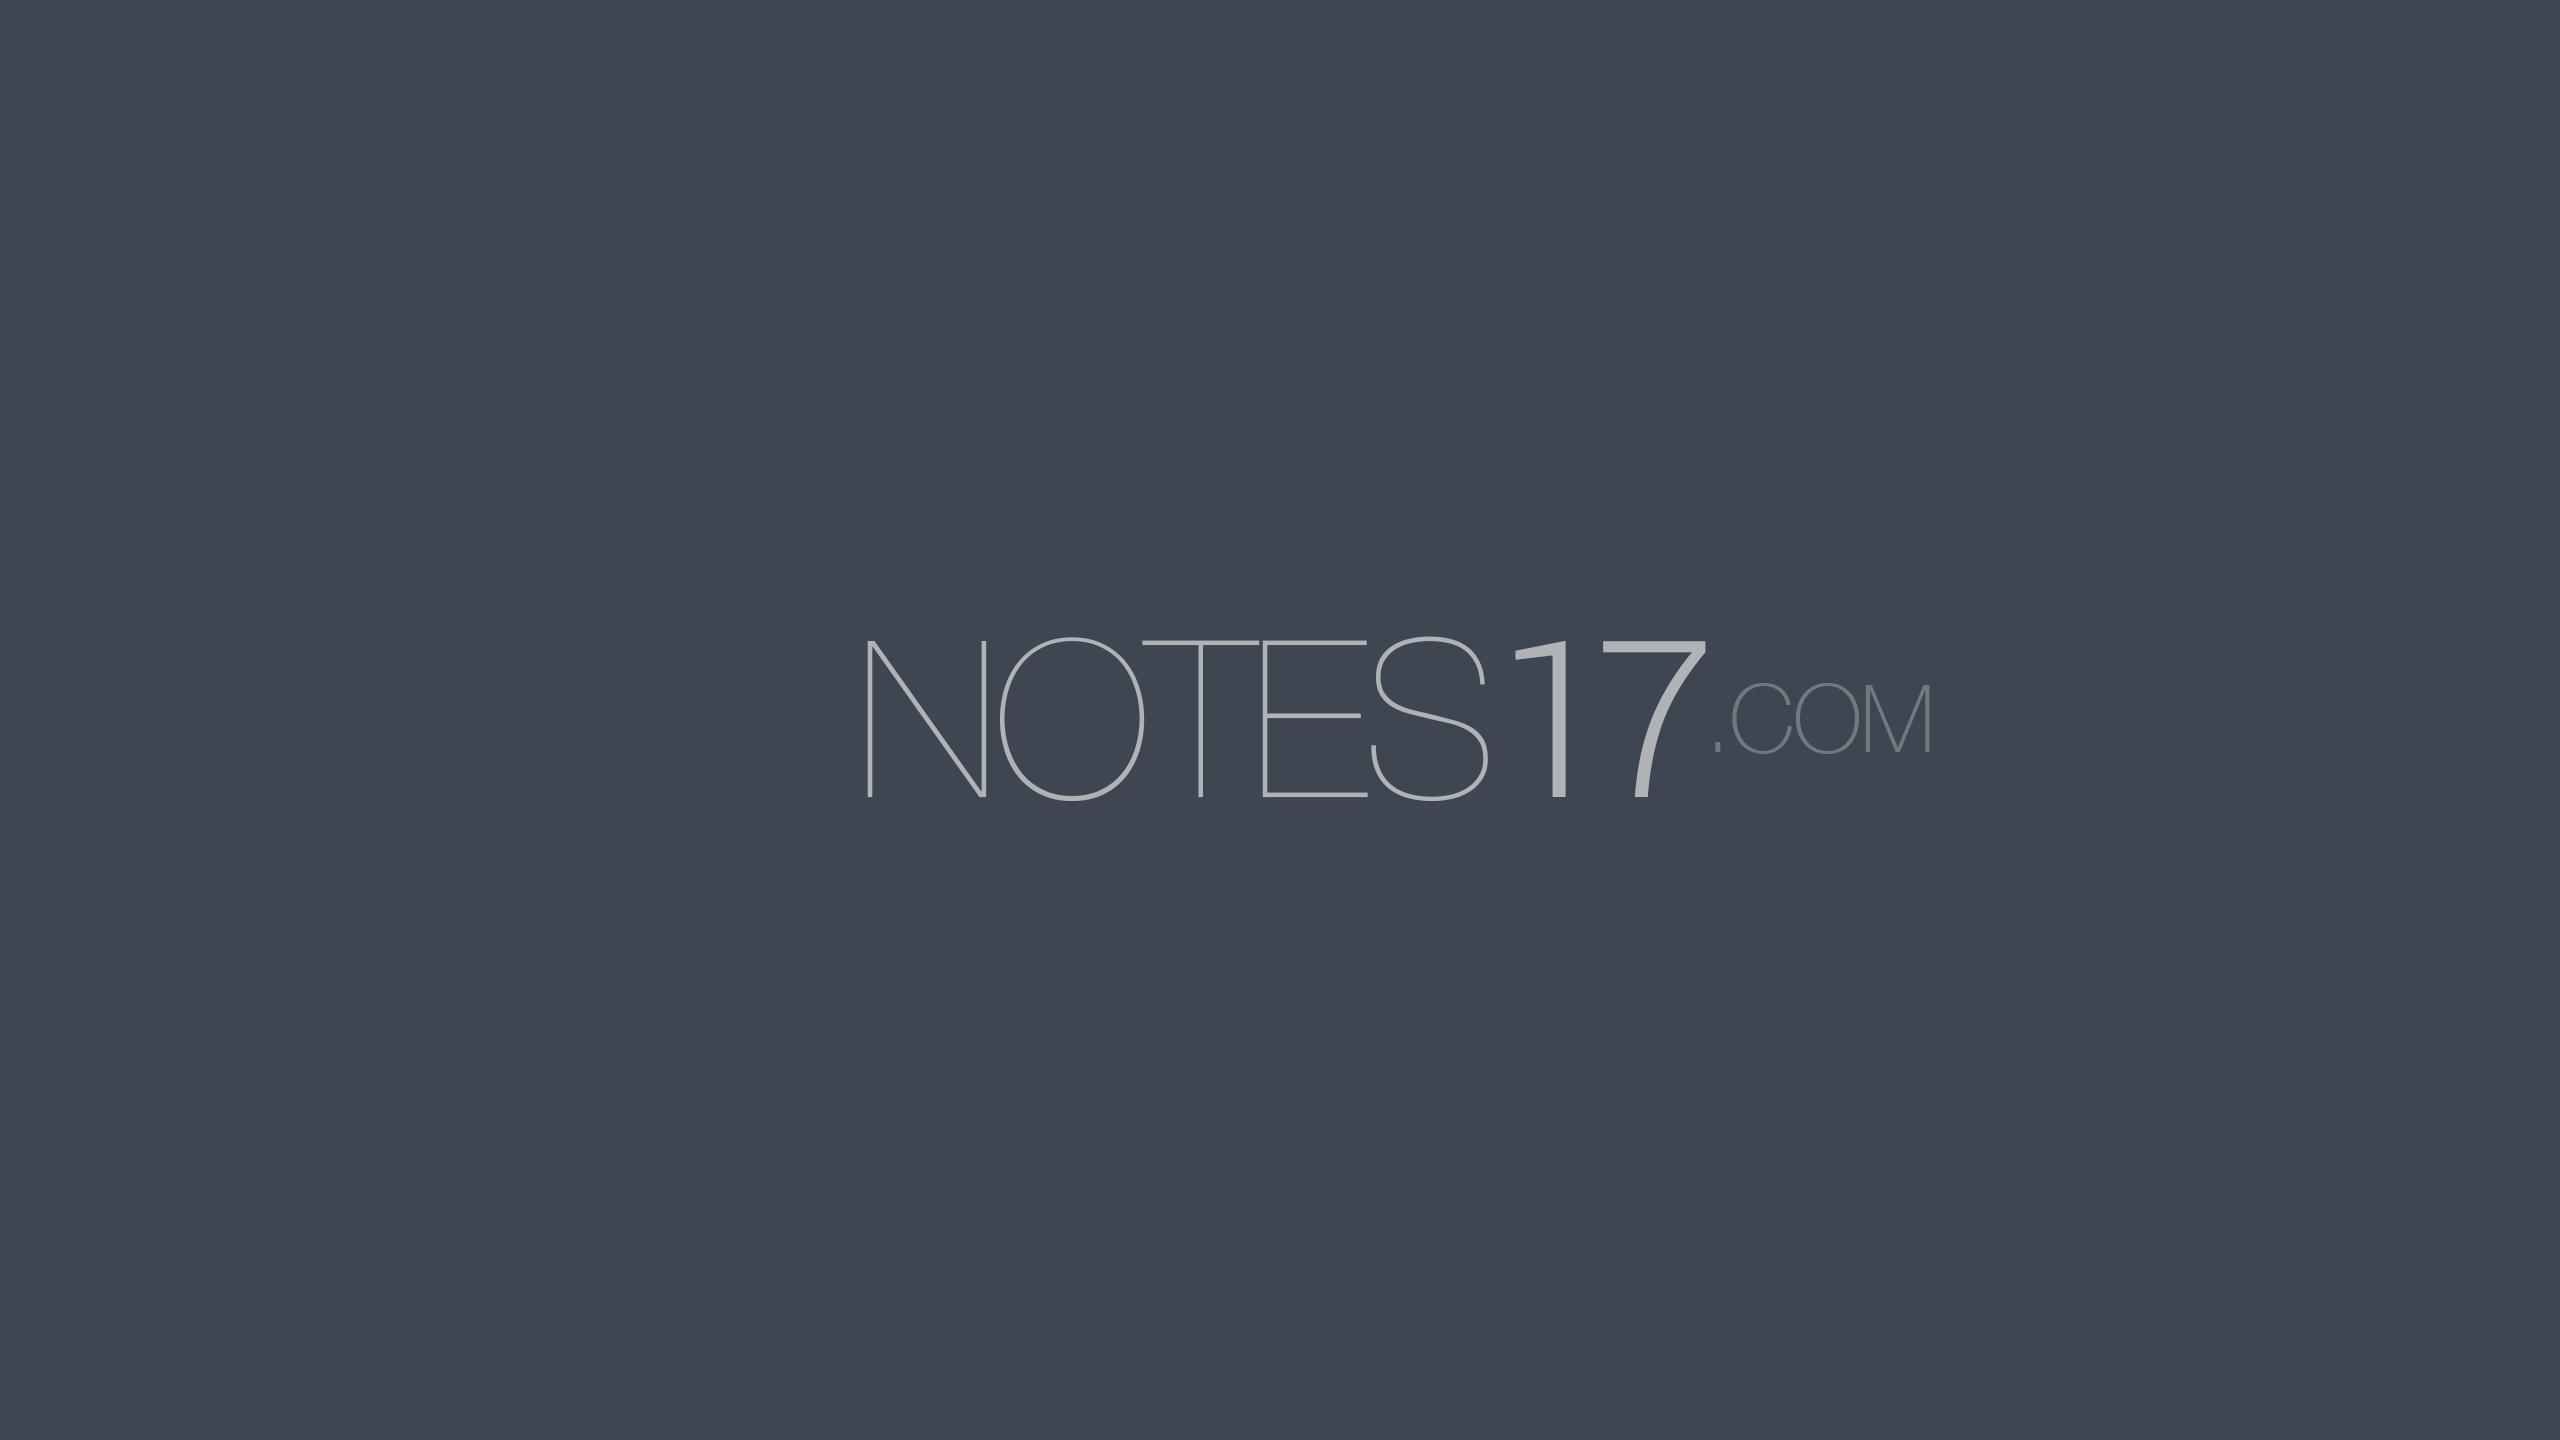 NOTES17 LLC Logo